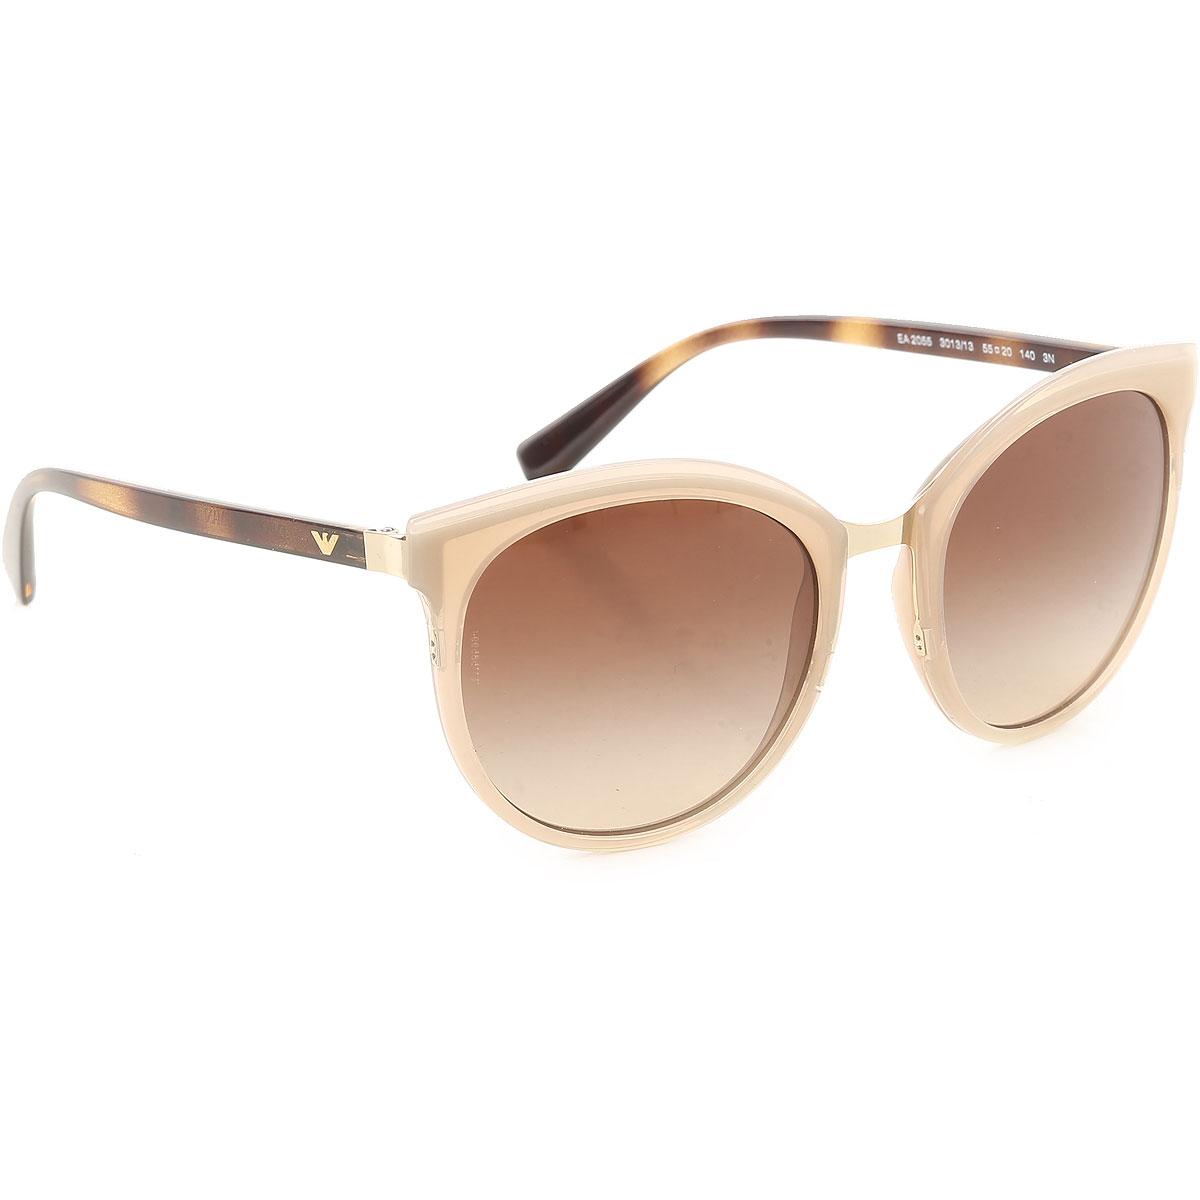 Emporio Armani Sunglasses, Nude, 2017 USA-442289